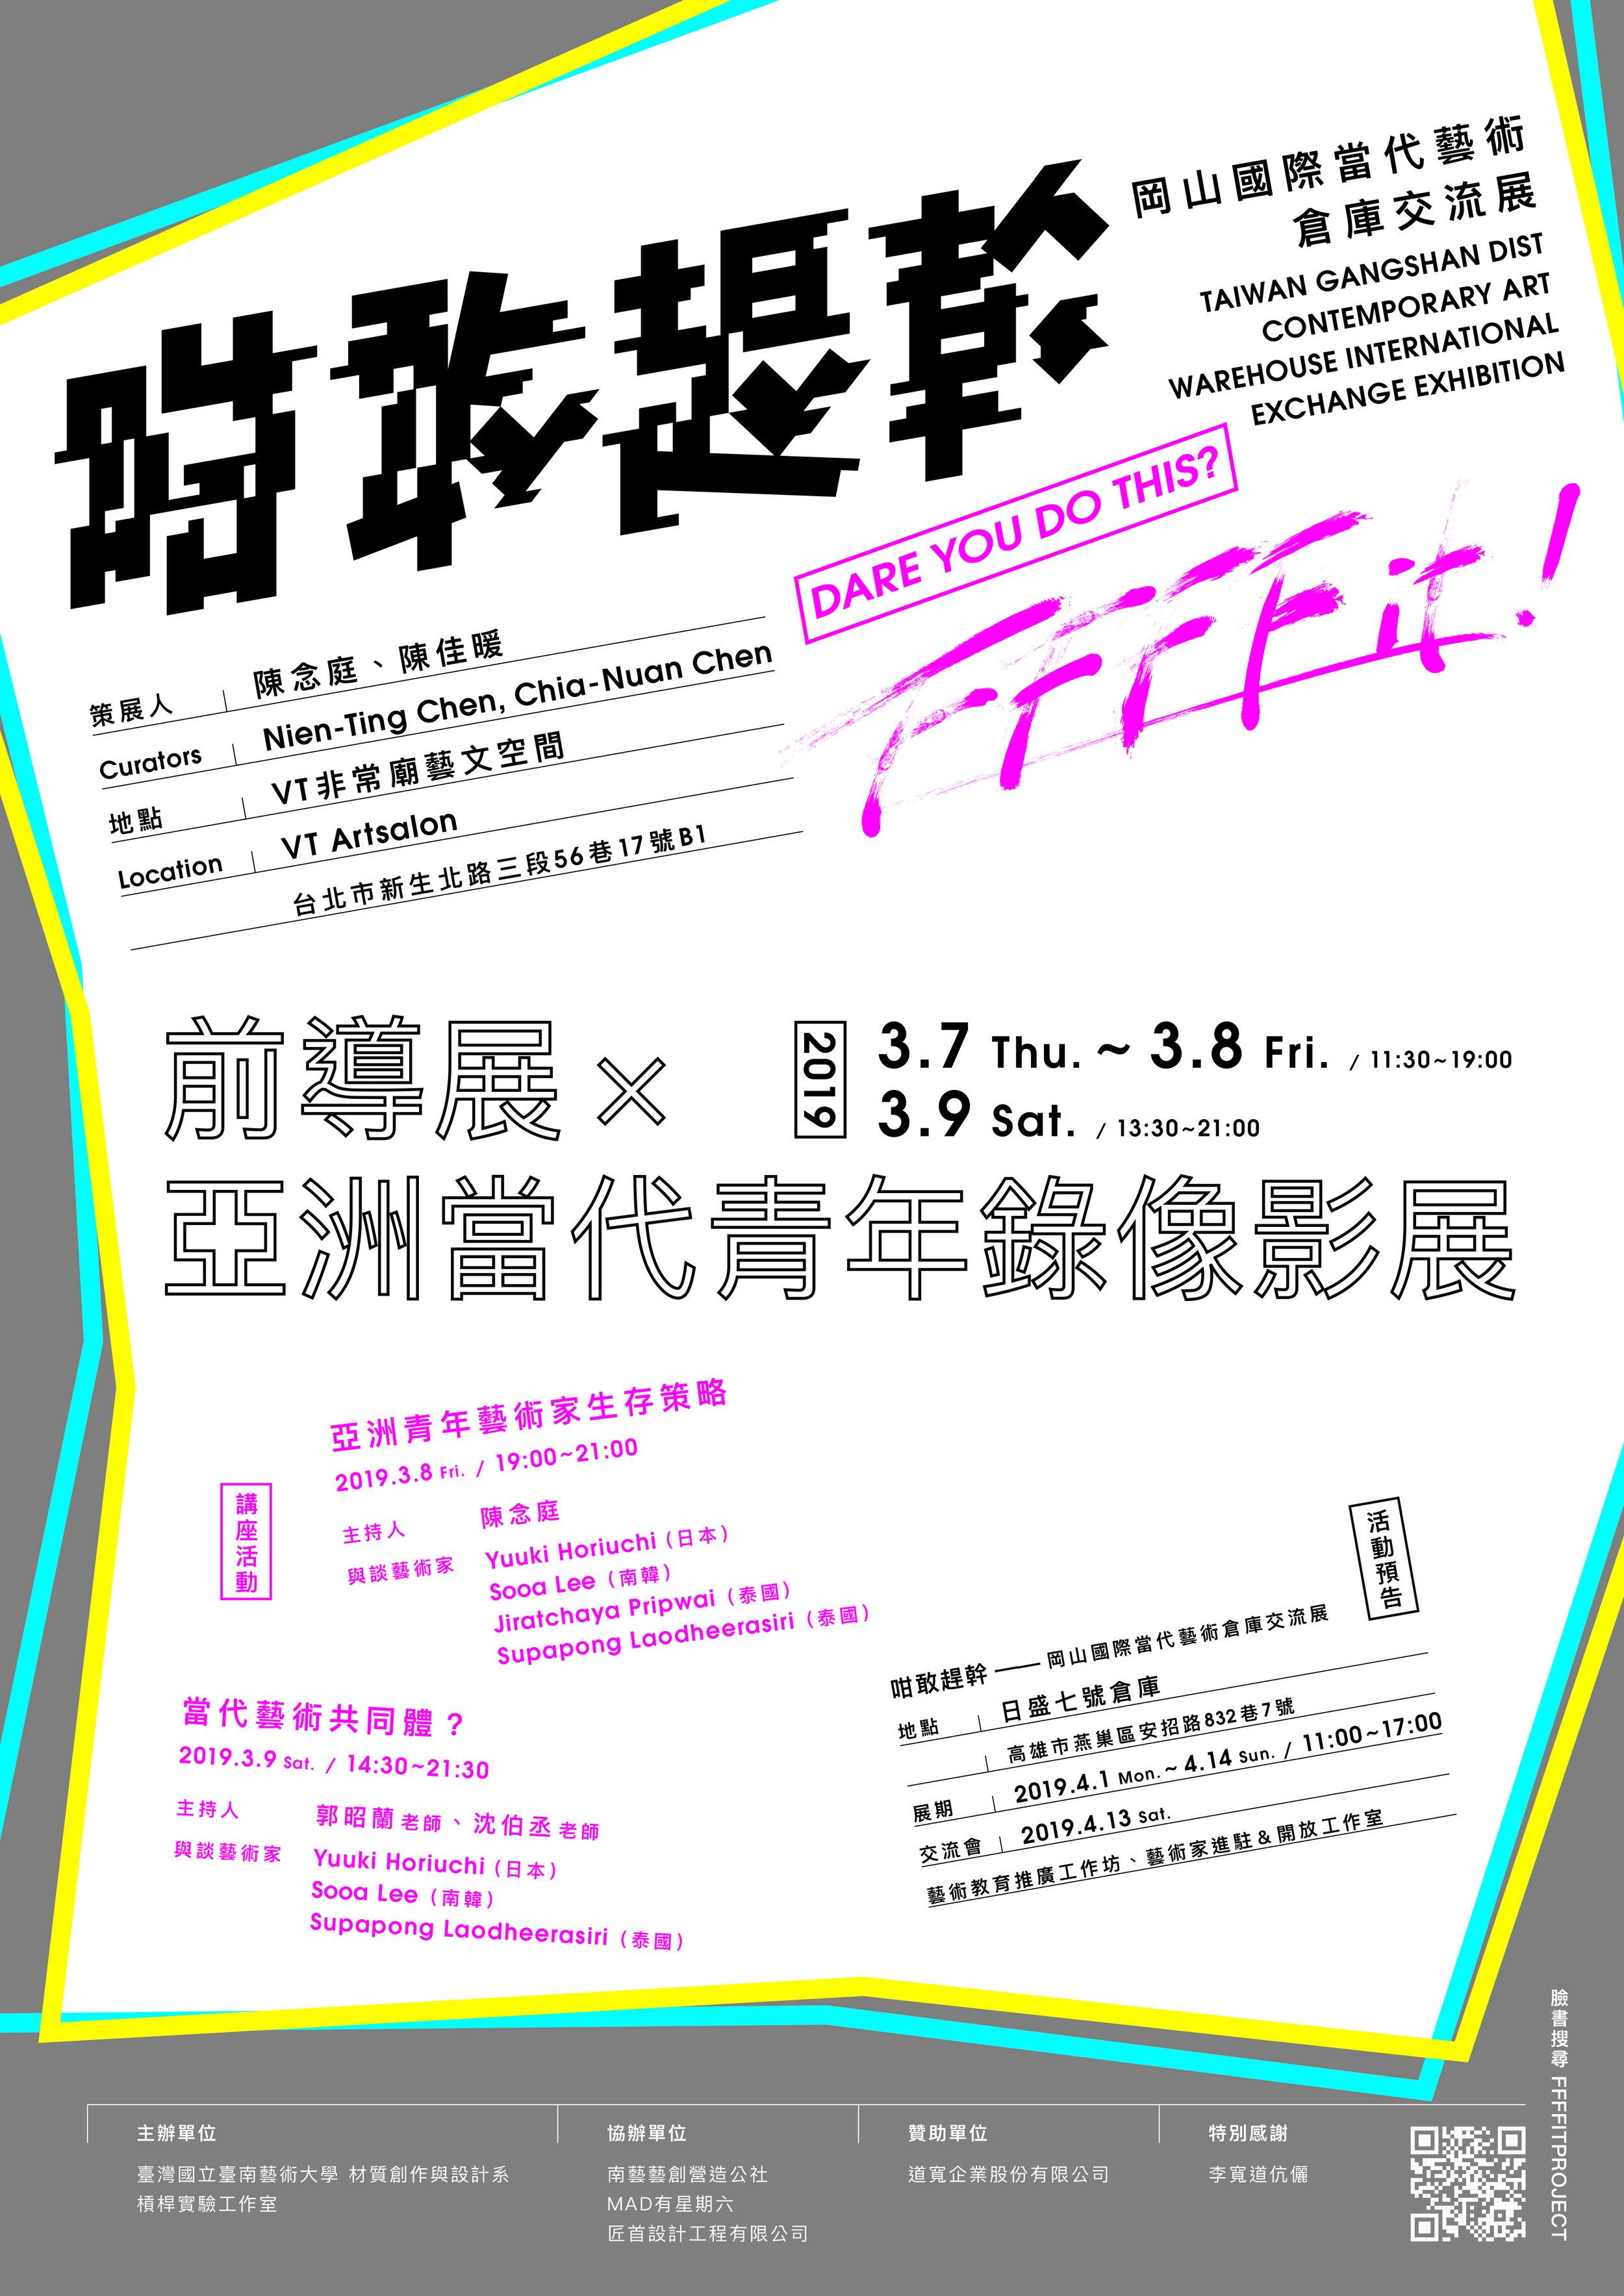 FFFF_A3-2.jpg